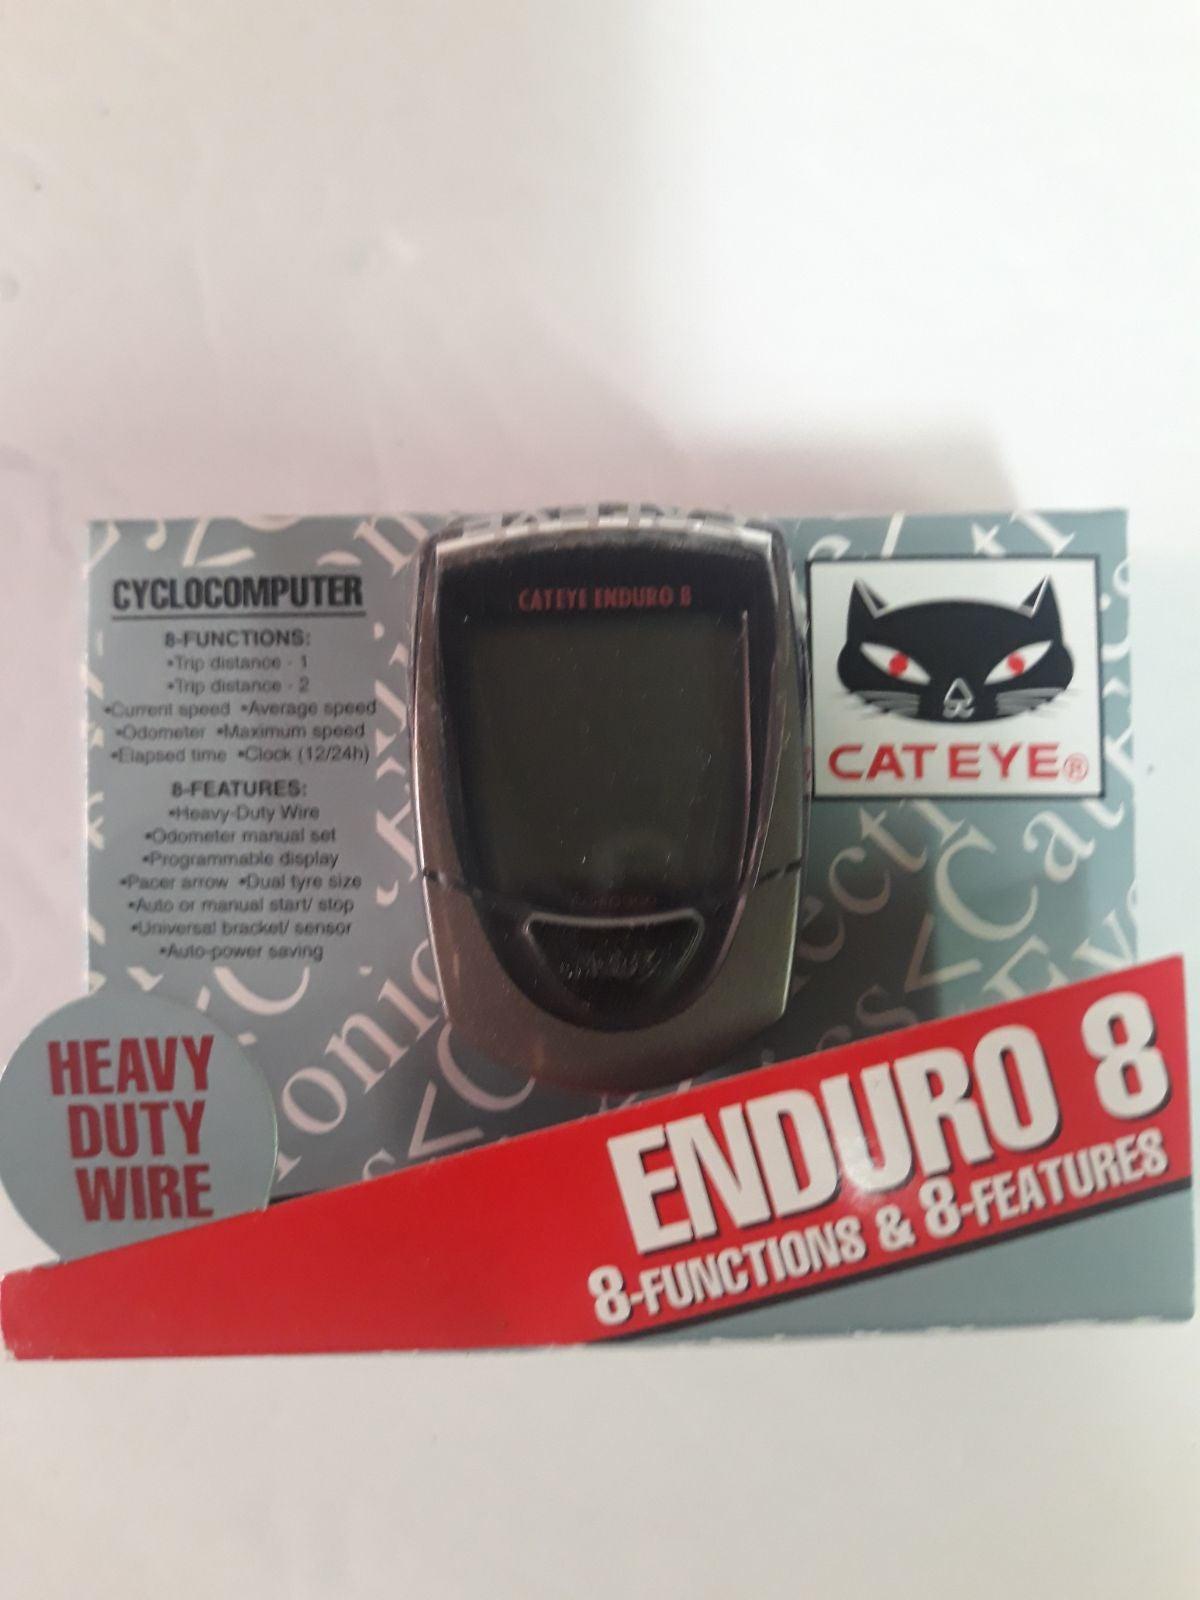 Cateye Enduro 8 Cycling Computer